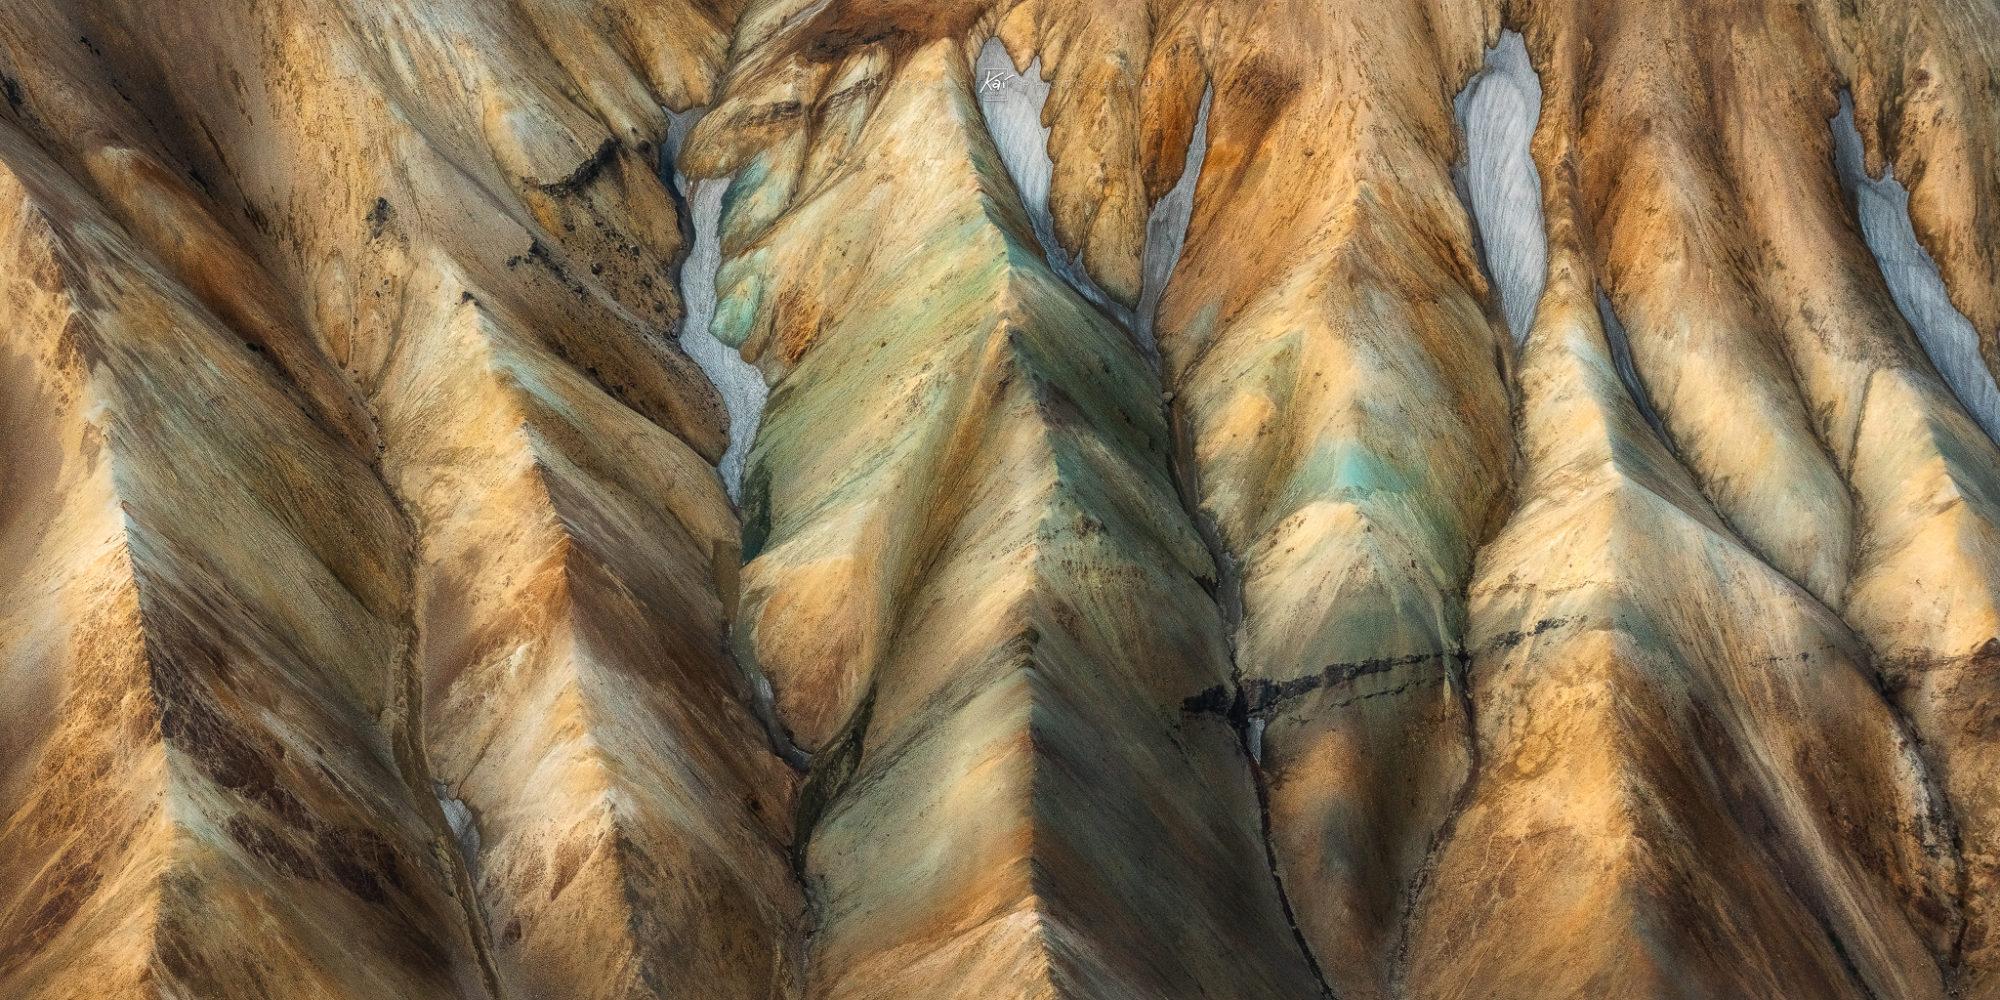 rippling-soil-fst